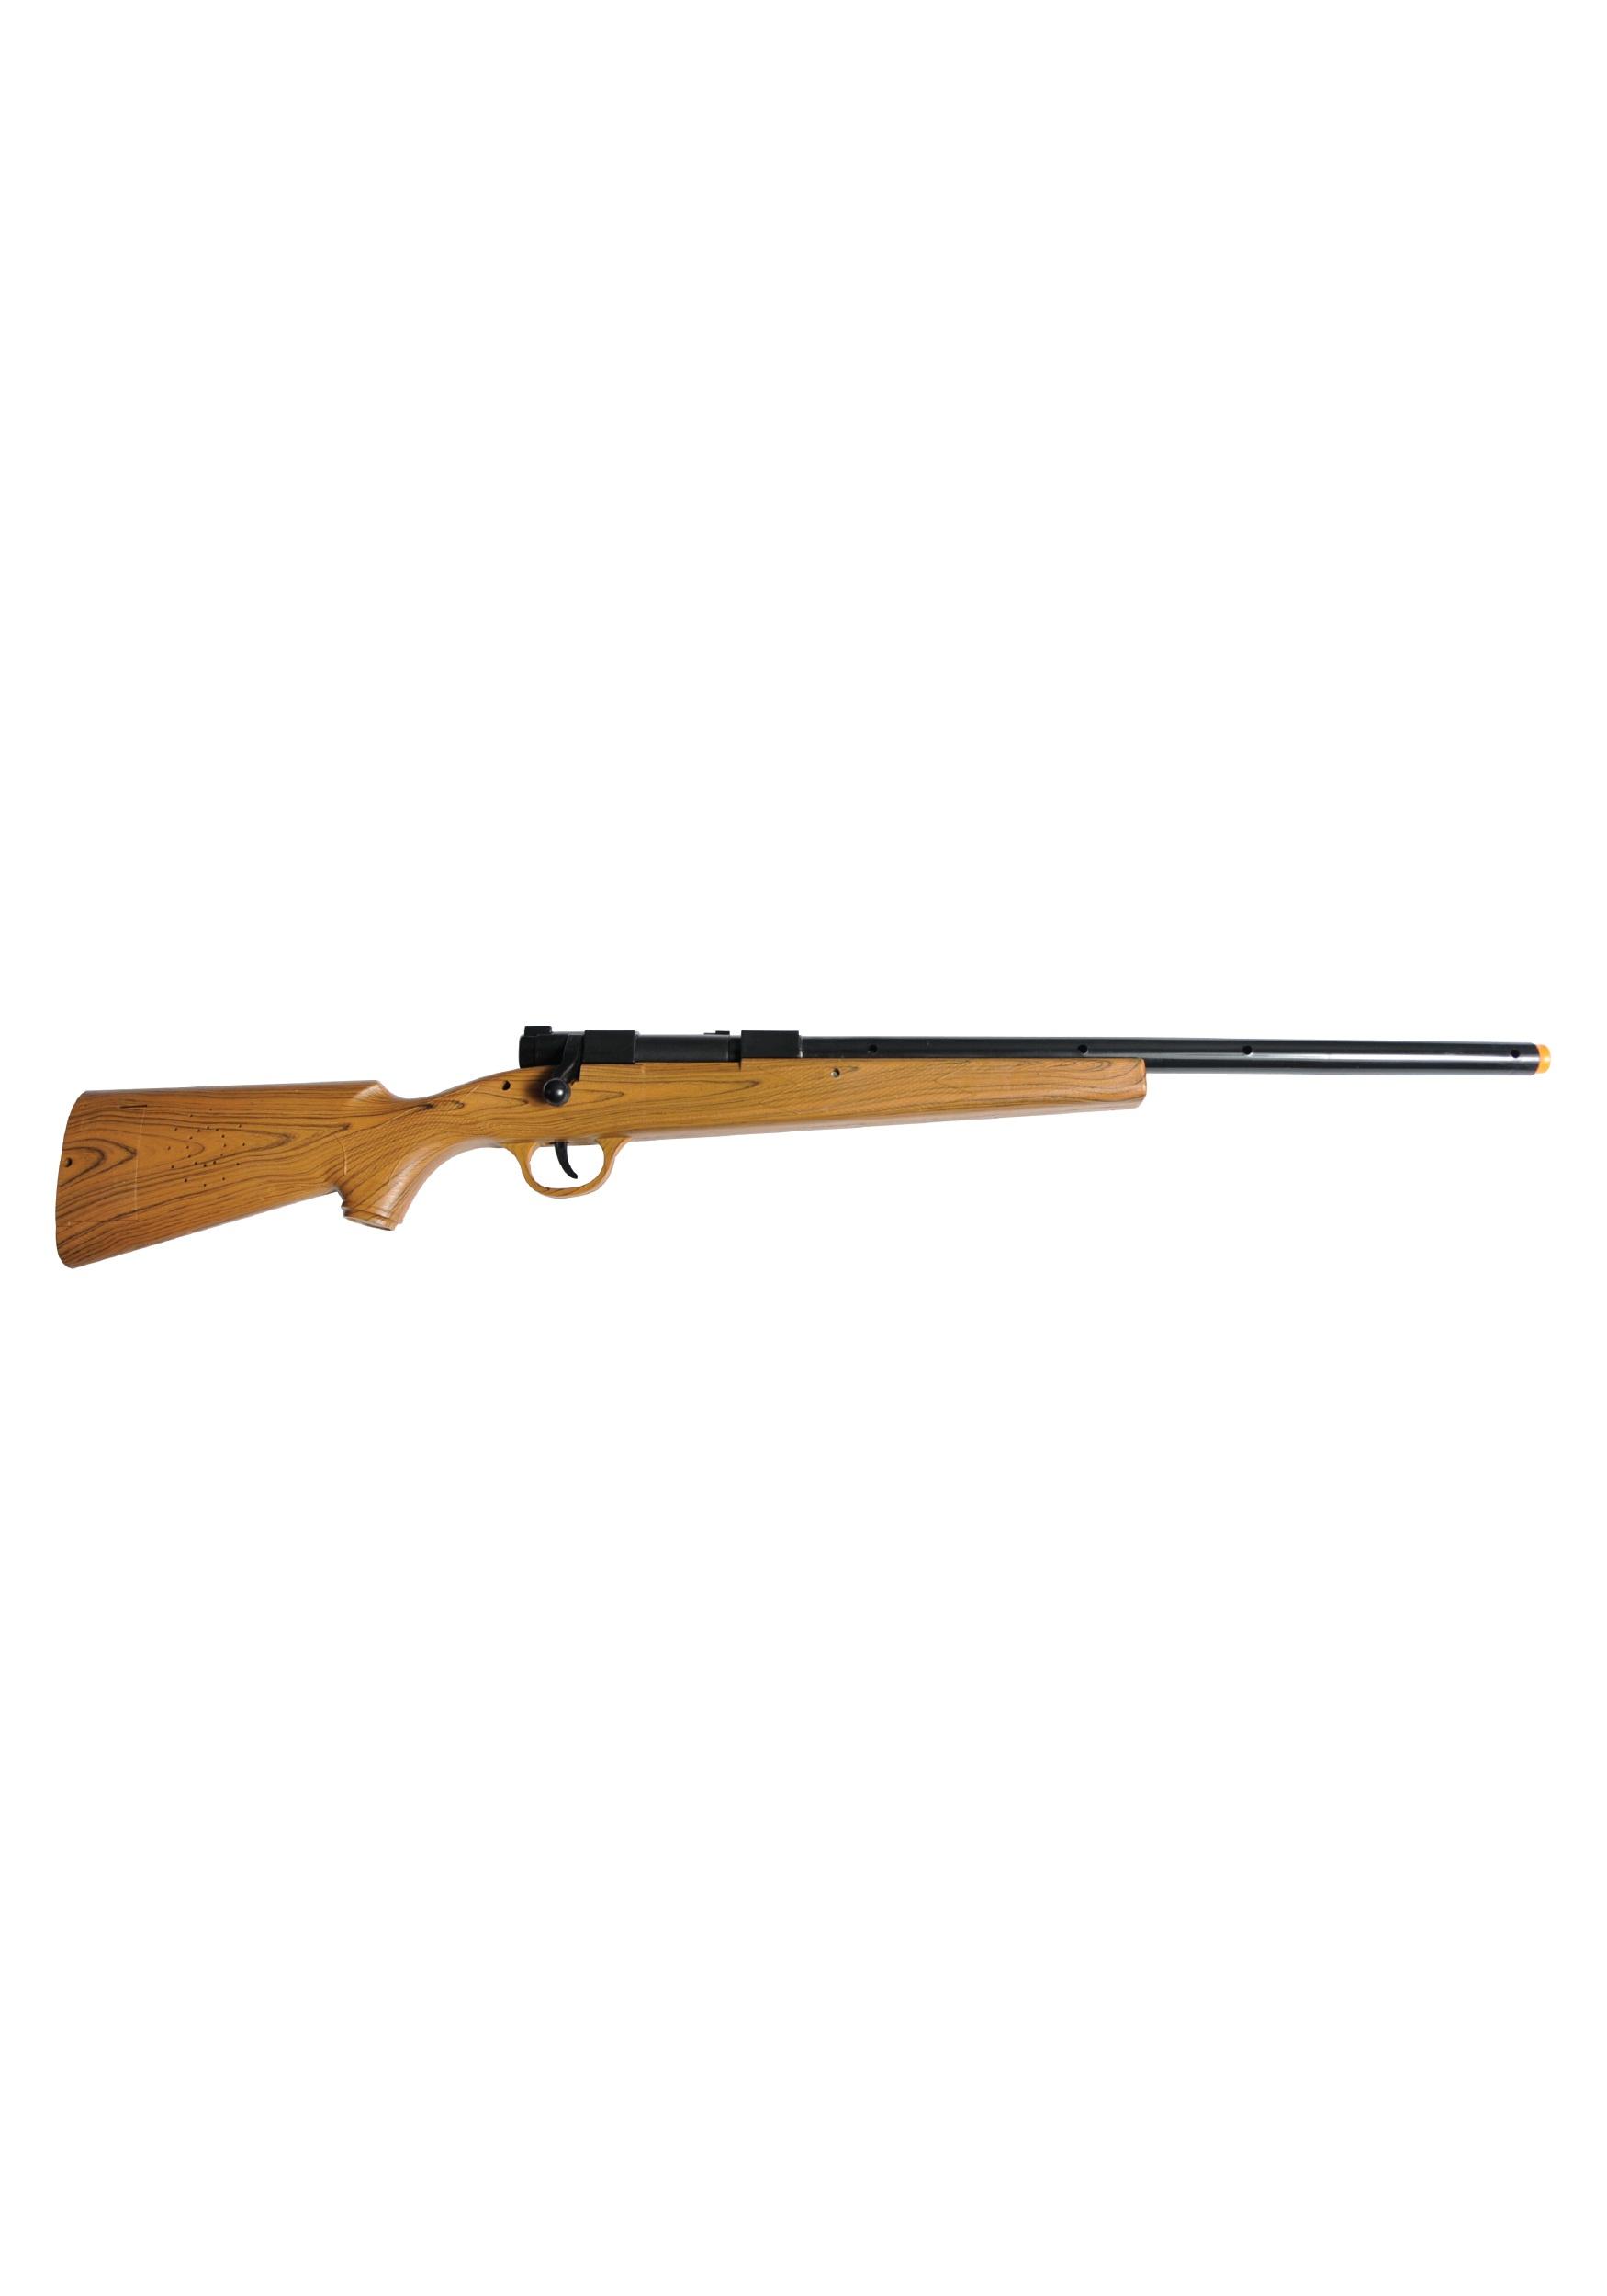 Toy Bolt Action Rifle SND10830B